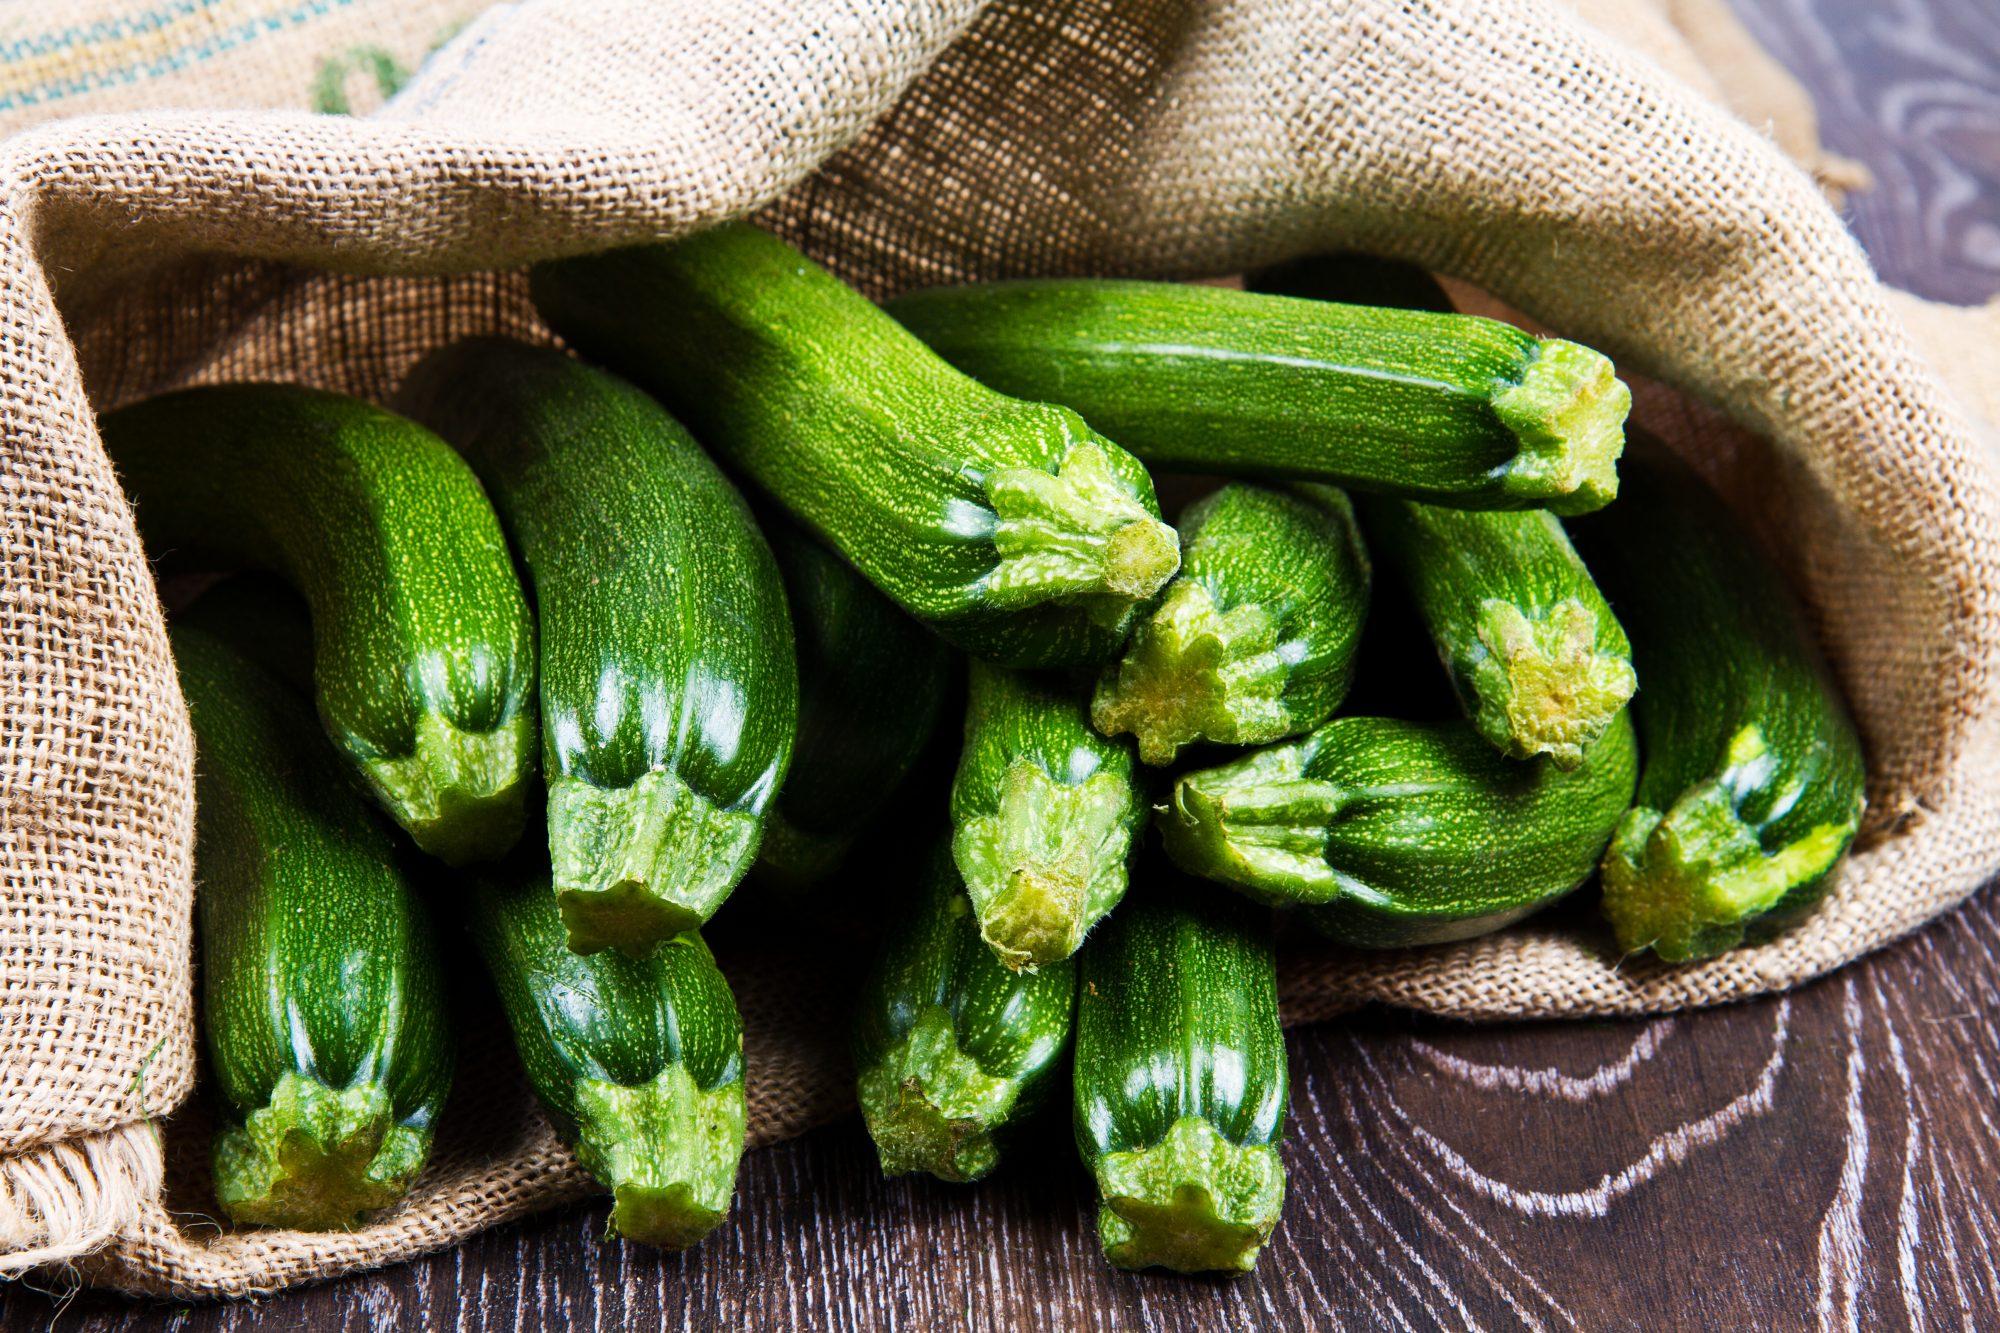 getty-zucchini-in-a-sack-image